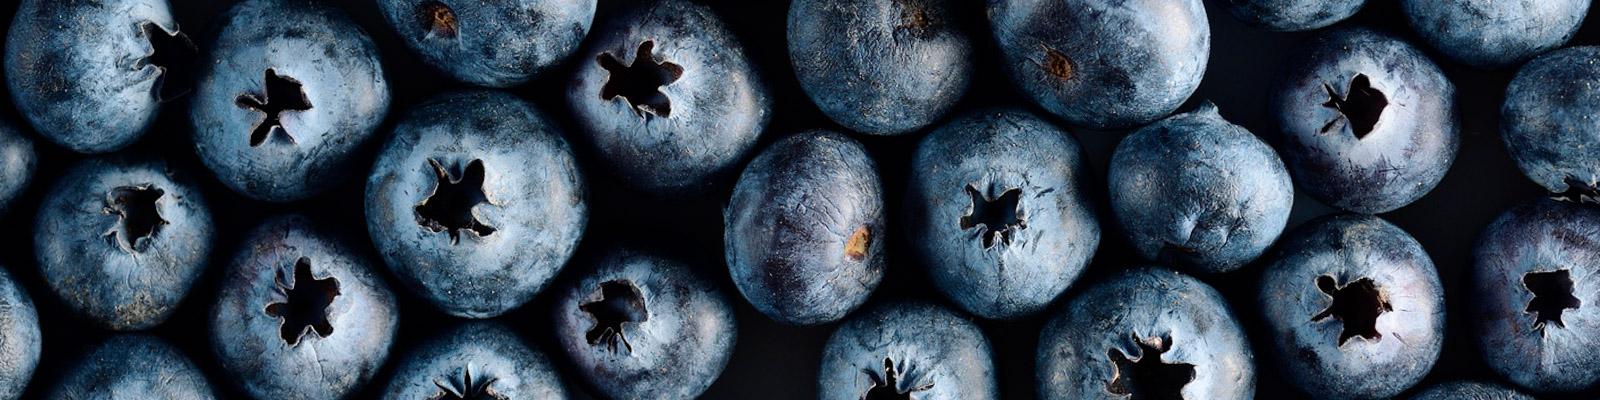 1600x400-Recipe-Blueberry-Compote.jpg